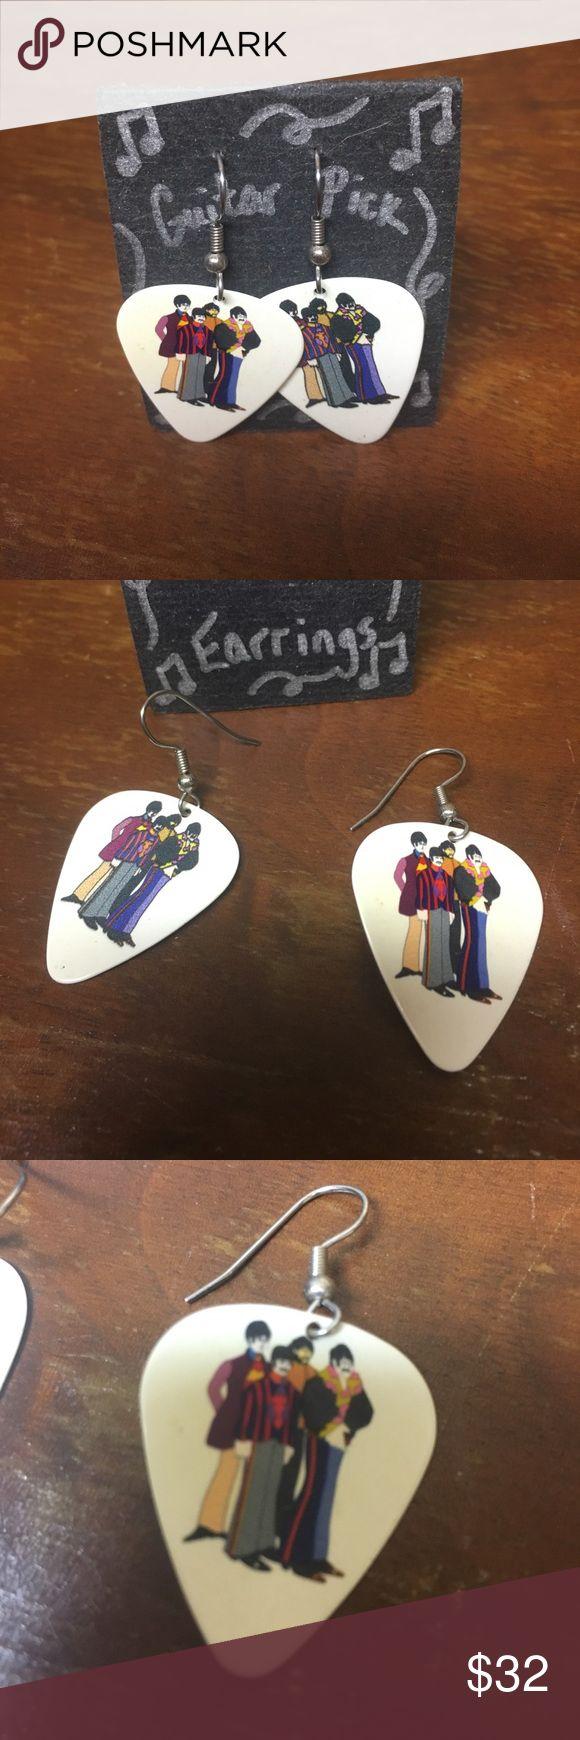 Guitar Pick Earring. Beatles Super awesome Beatles Band Guitar Pick earrings. Hand made. Hanging / dangling earrings. Open to offers Jewelry Earrings